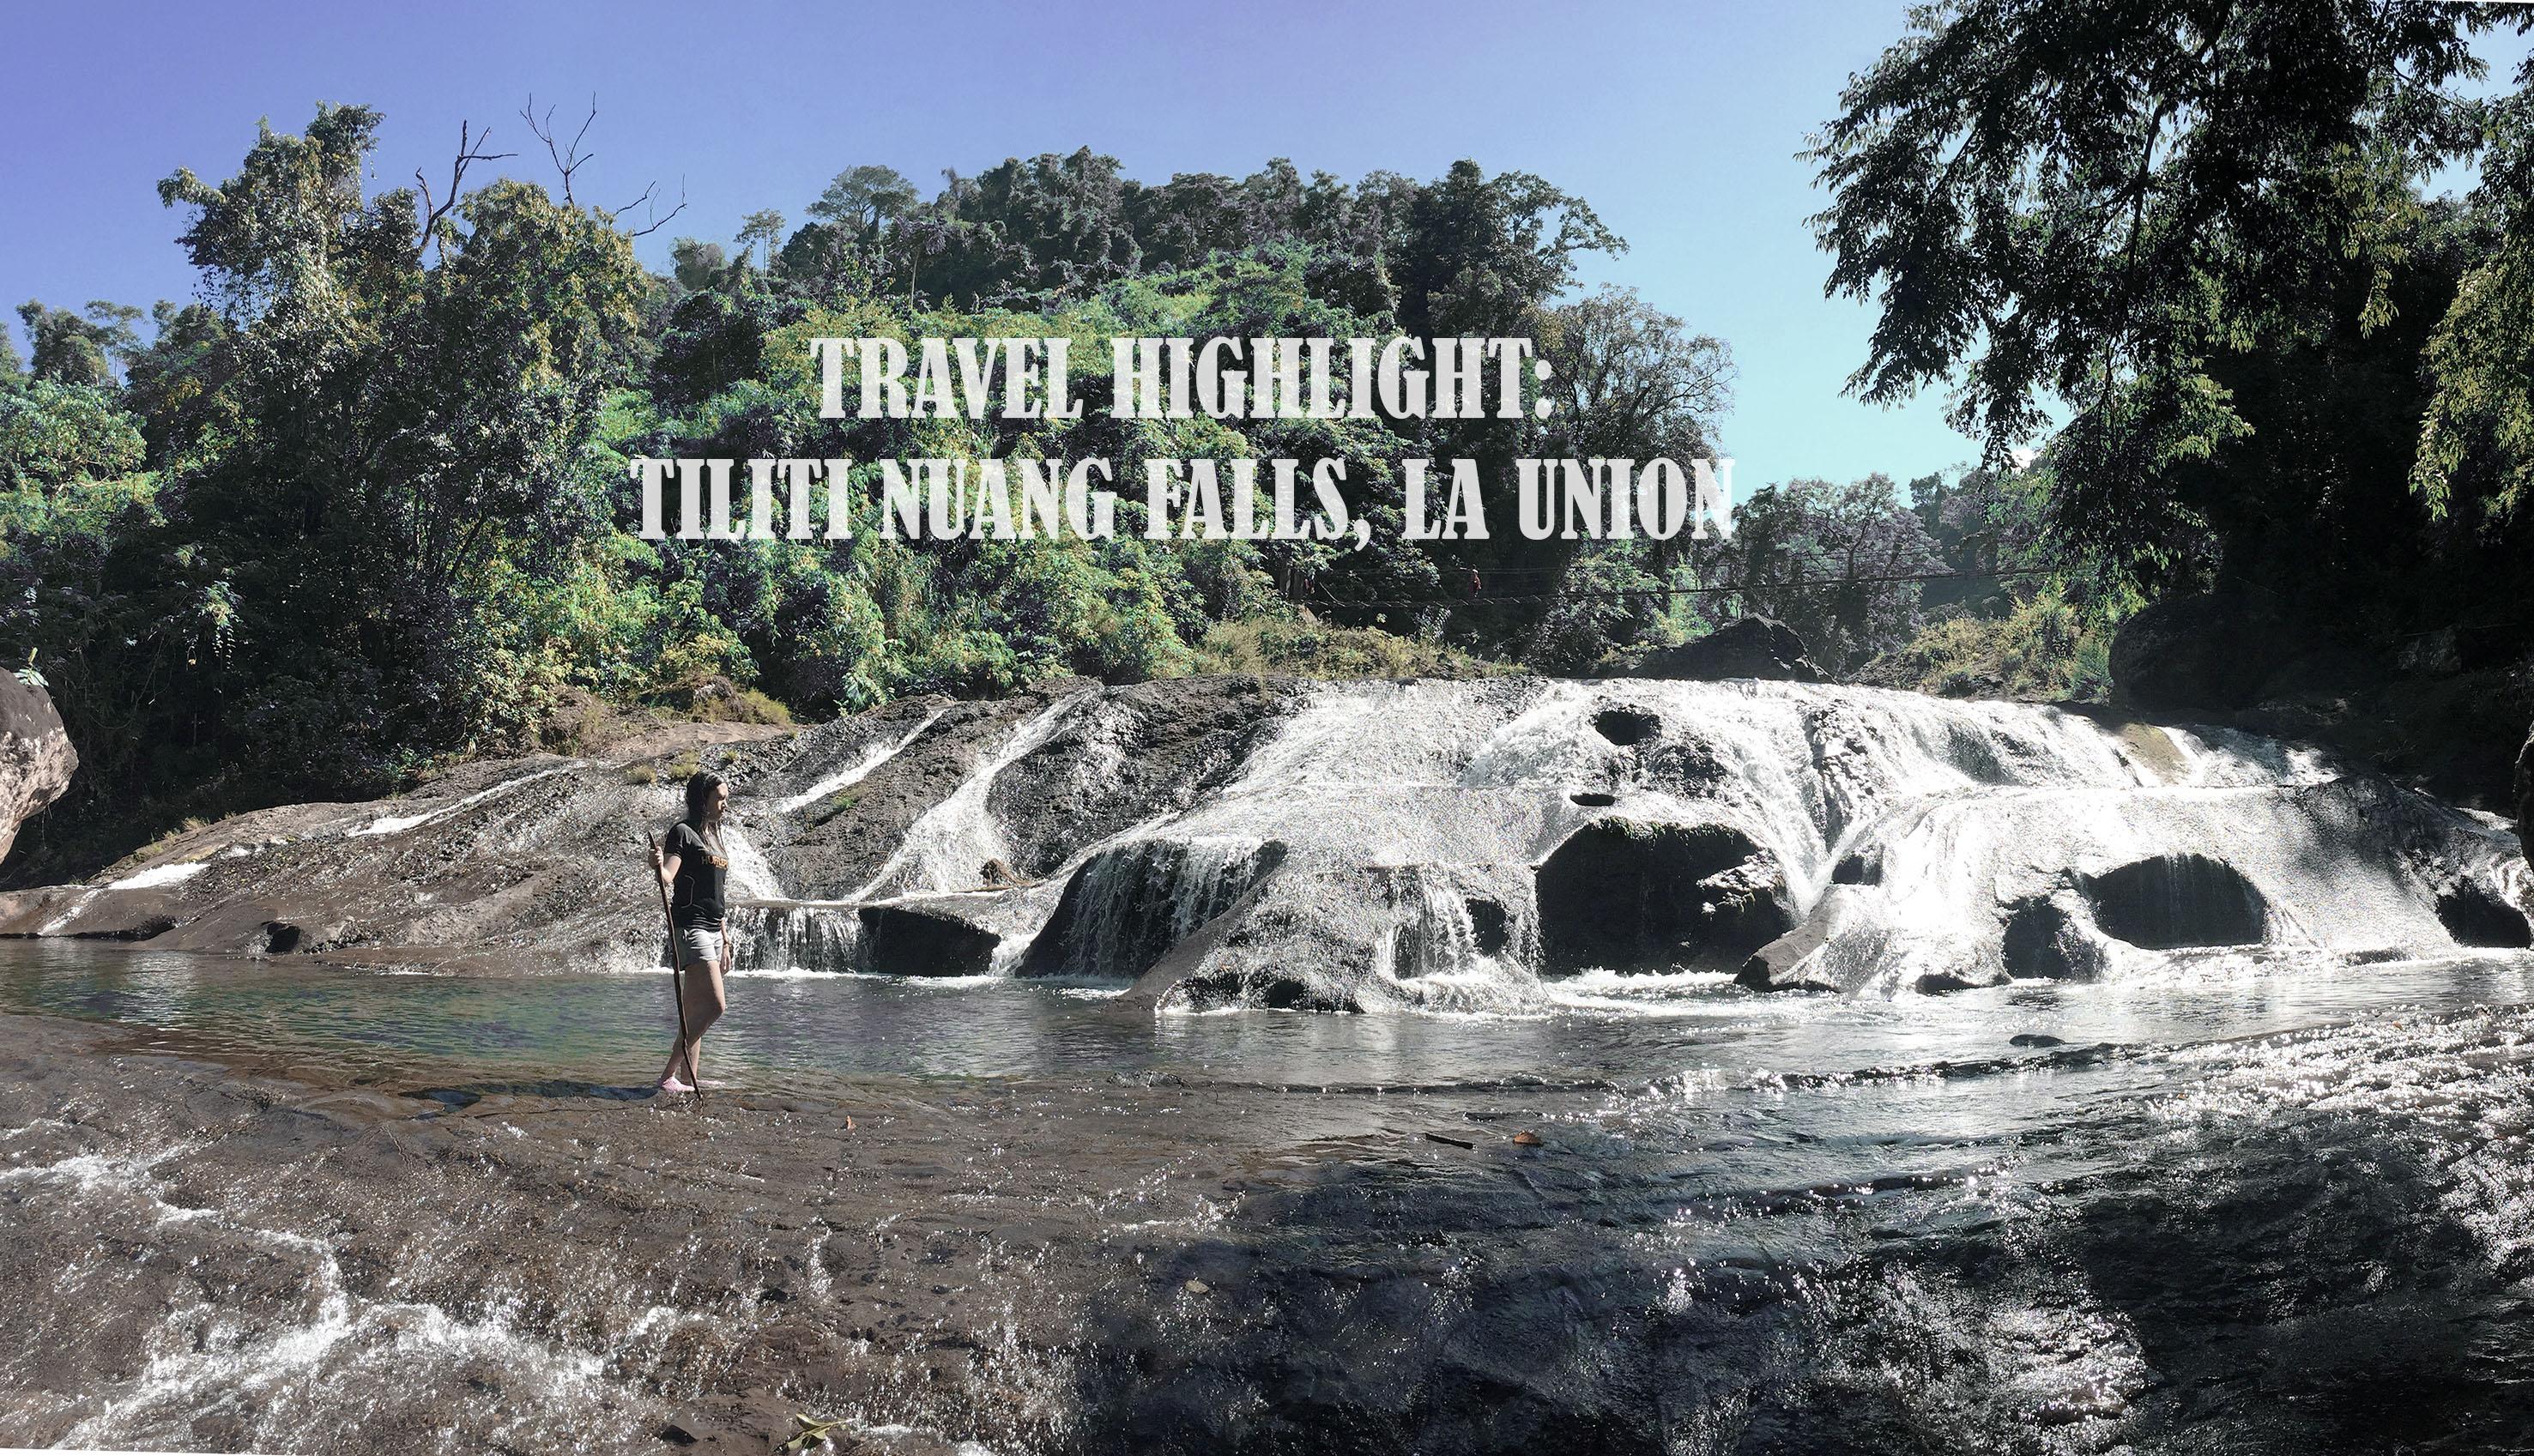 Tiliti Nuang Falls Banner